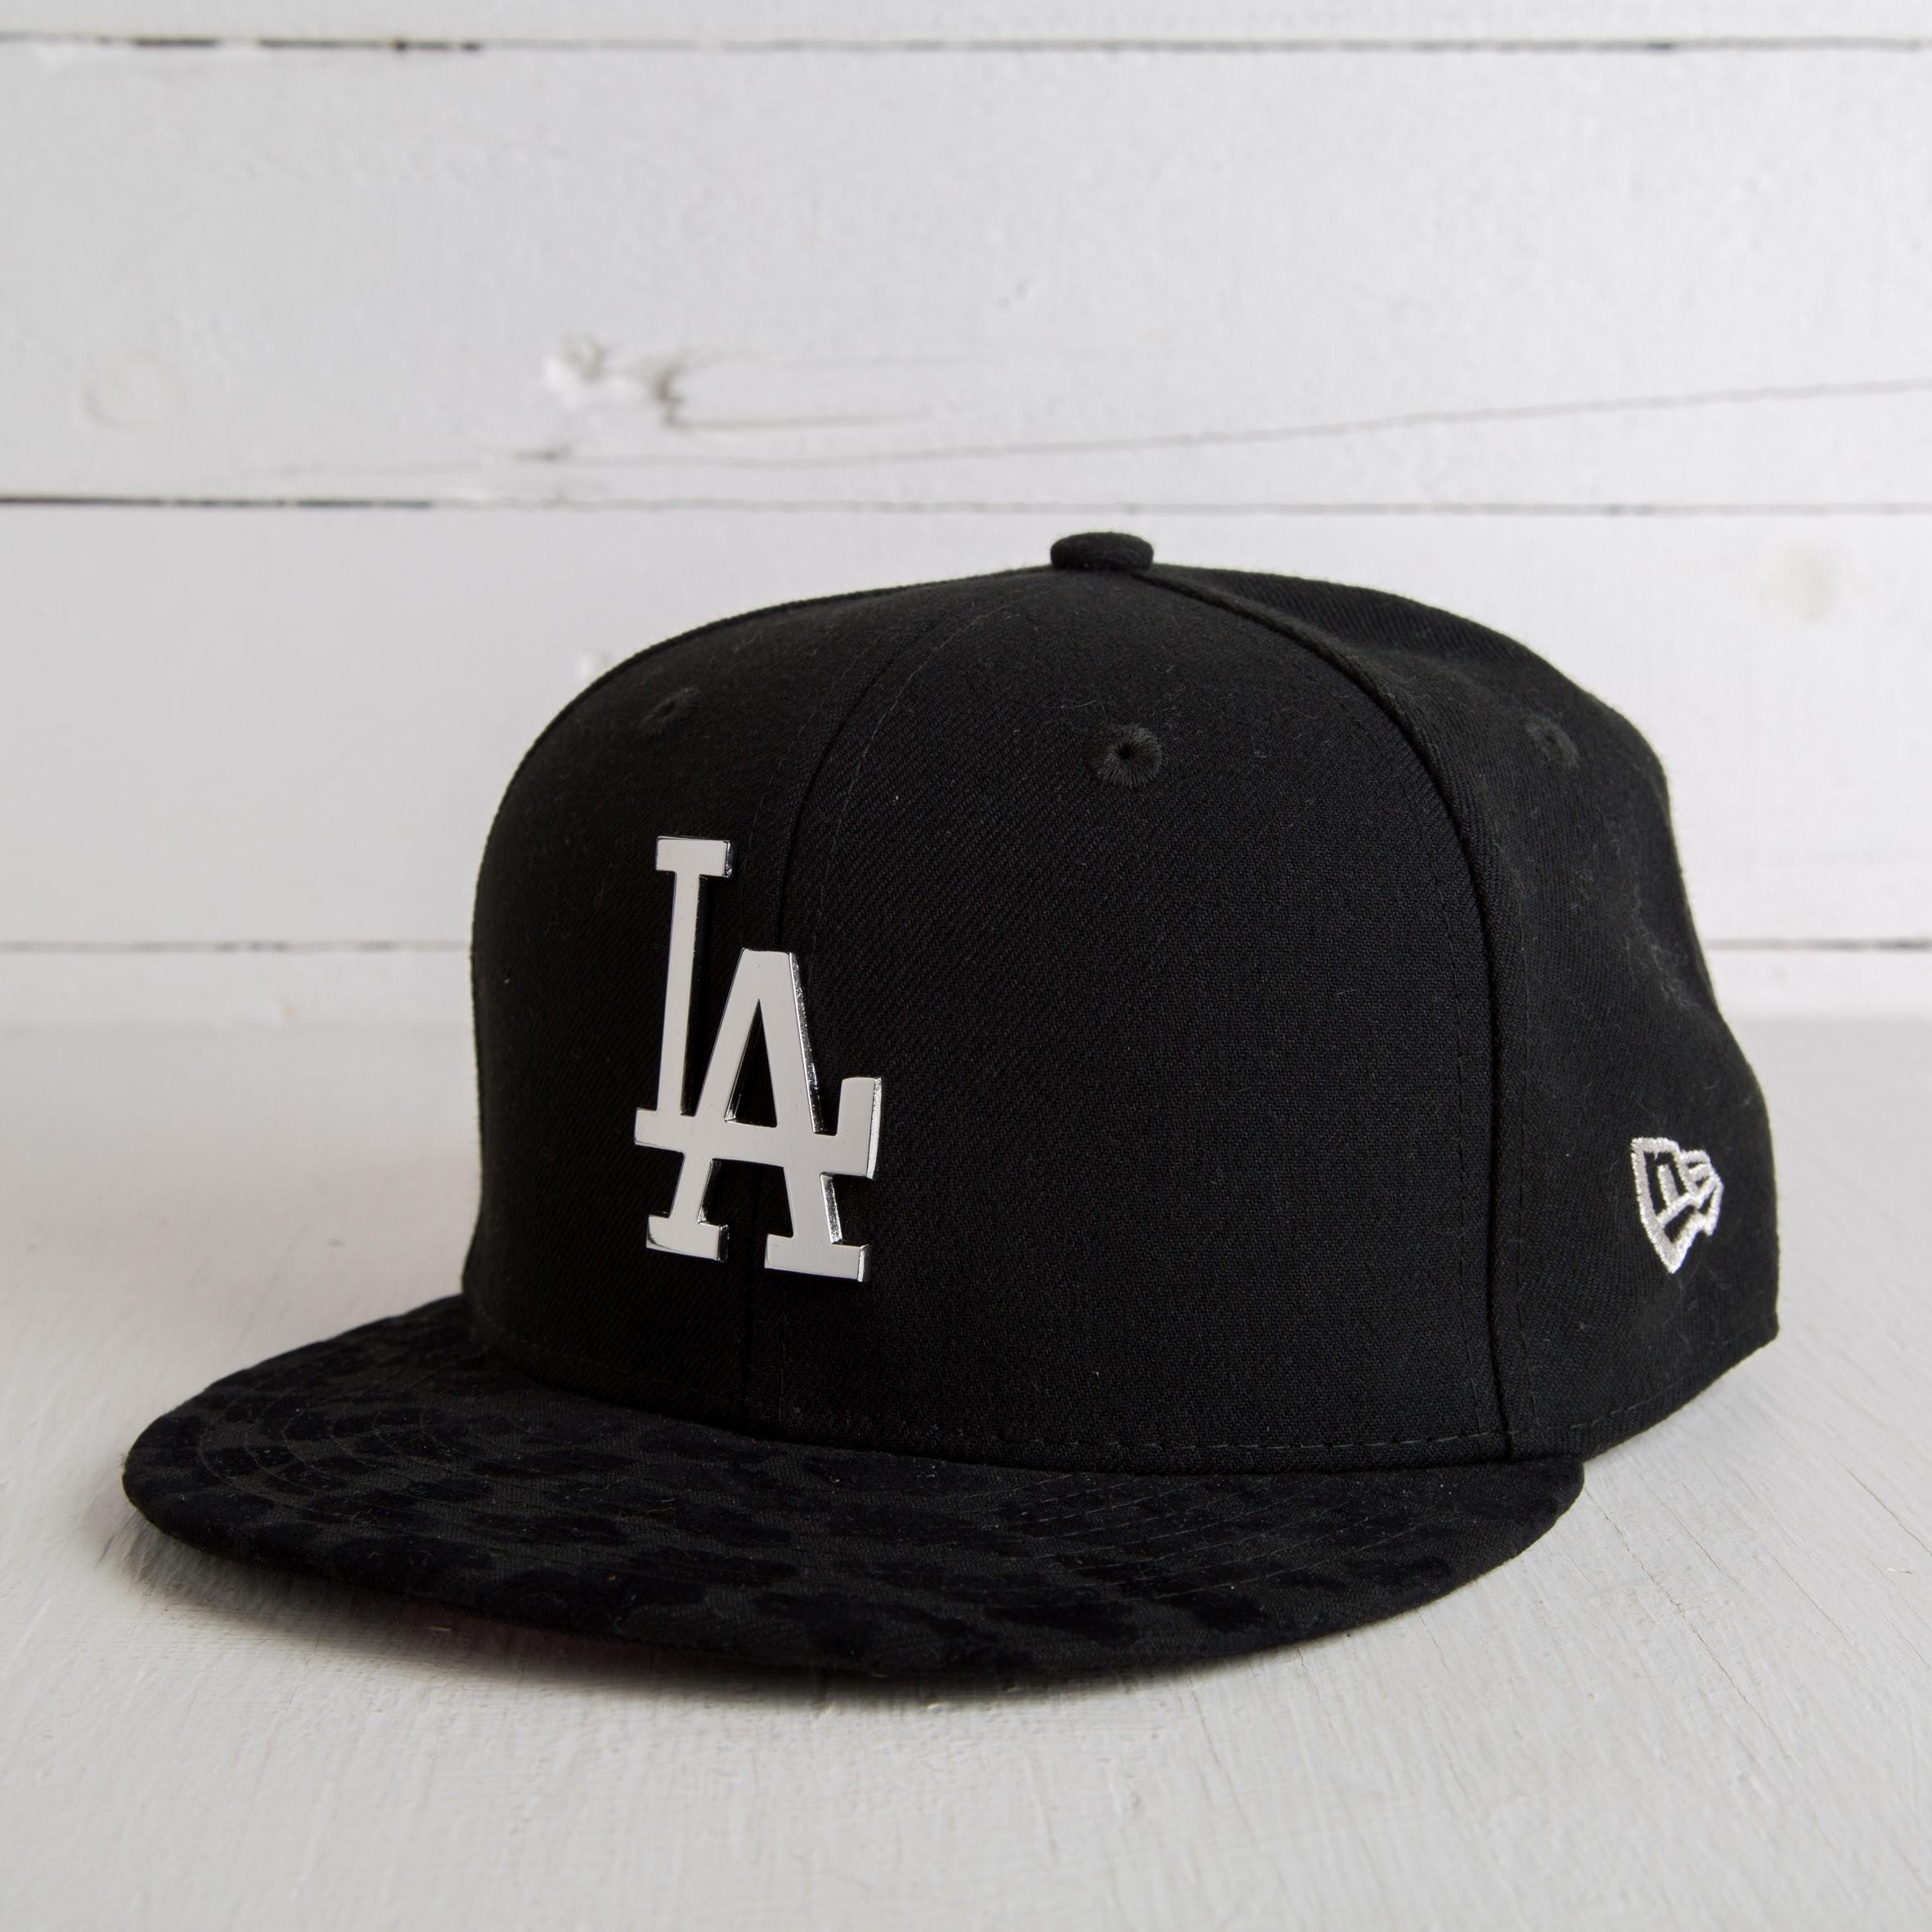 New Era 9FIFTY Glitz Peak LA Dodgers Black/Silver - 4982